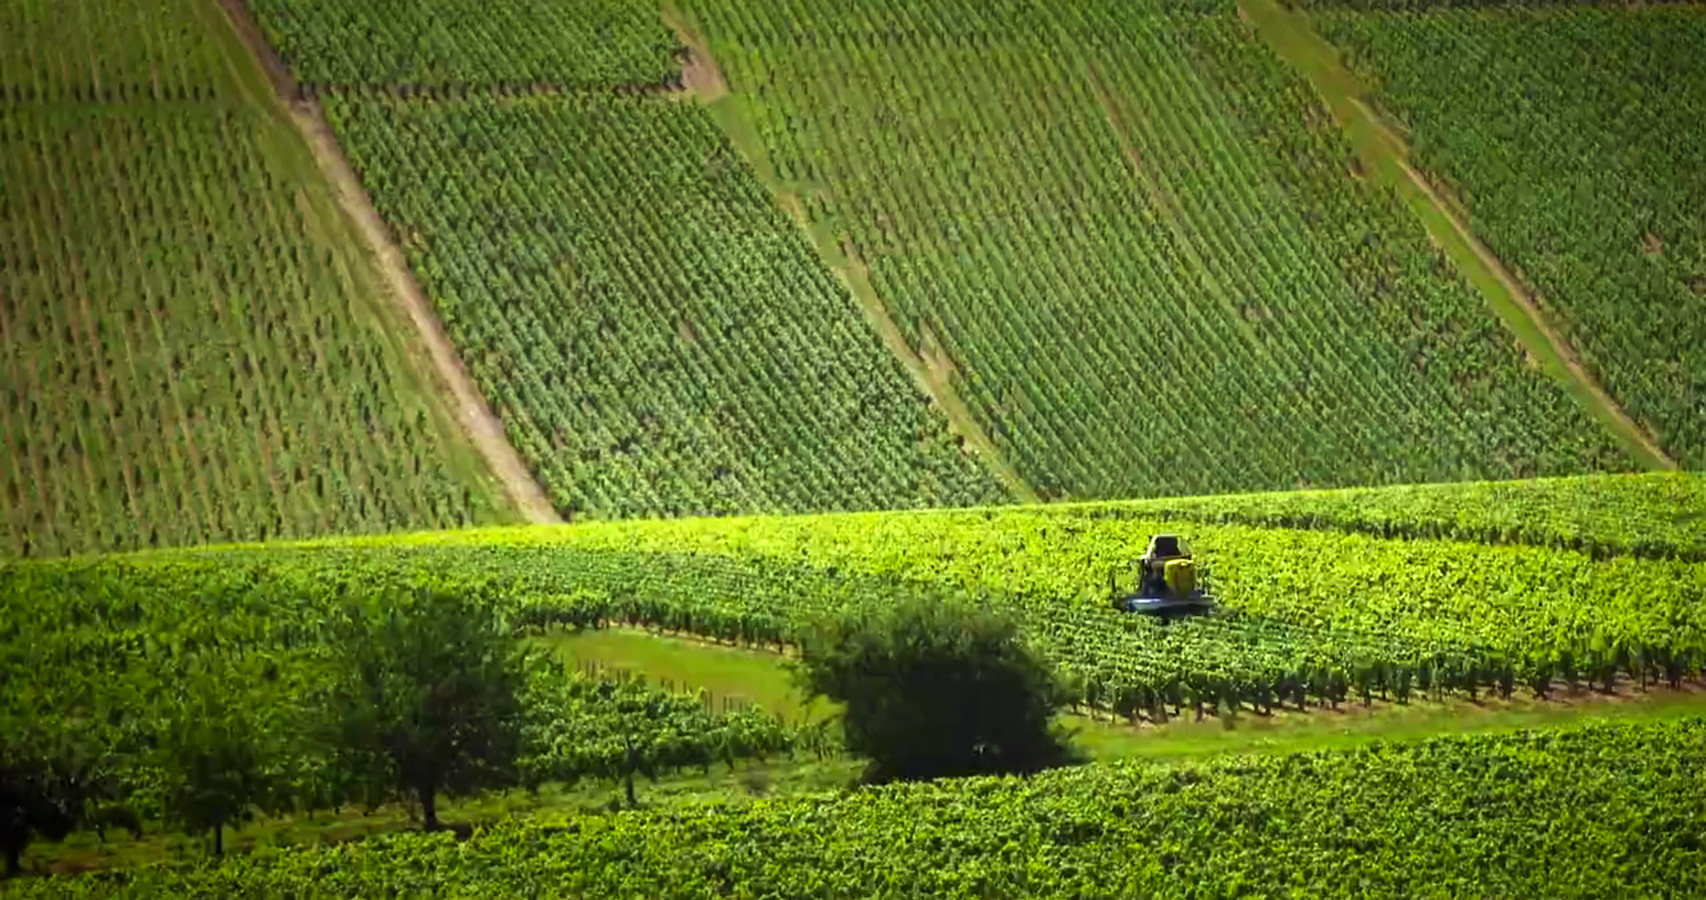 Premier Cru Chardonnay vineyard, Vaillons, in Chablis